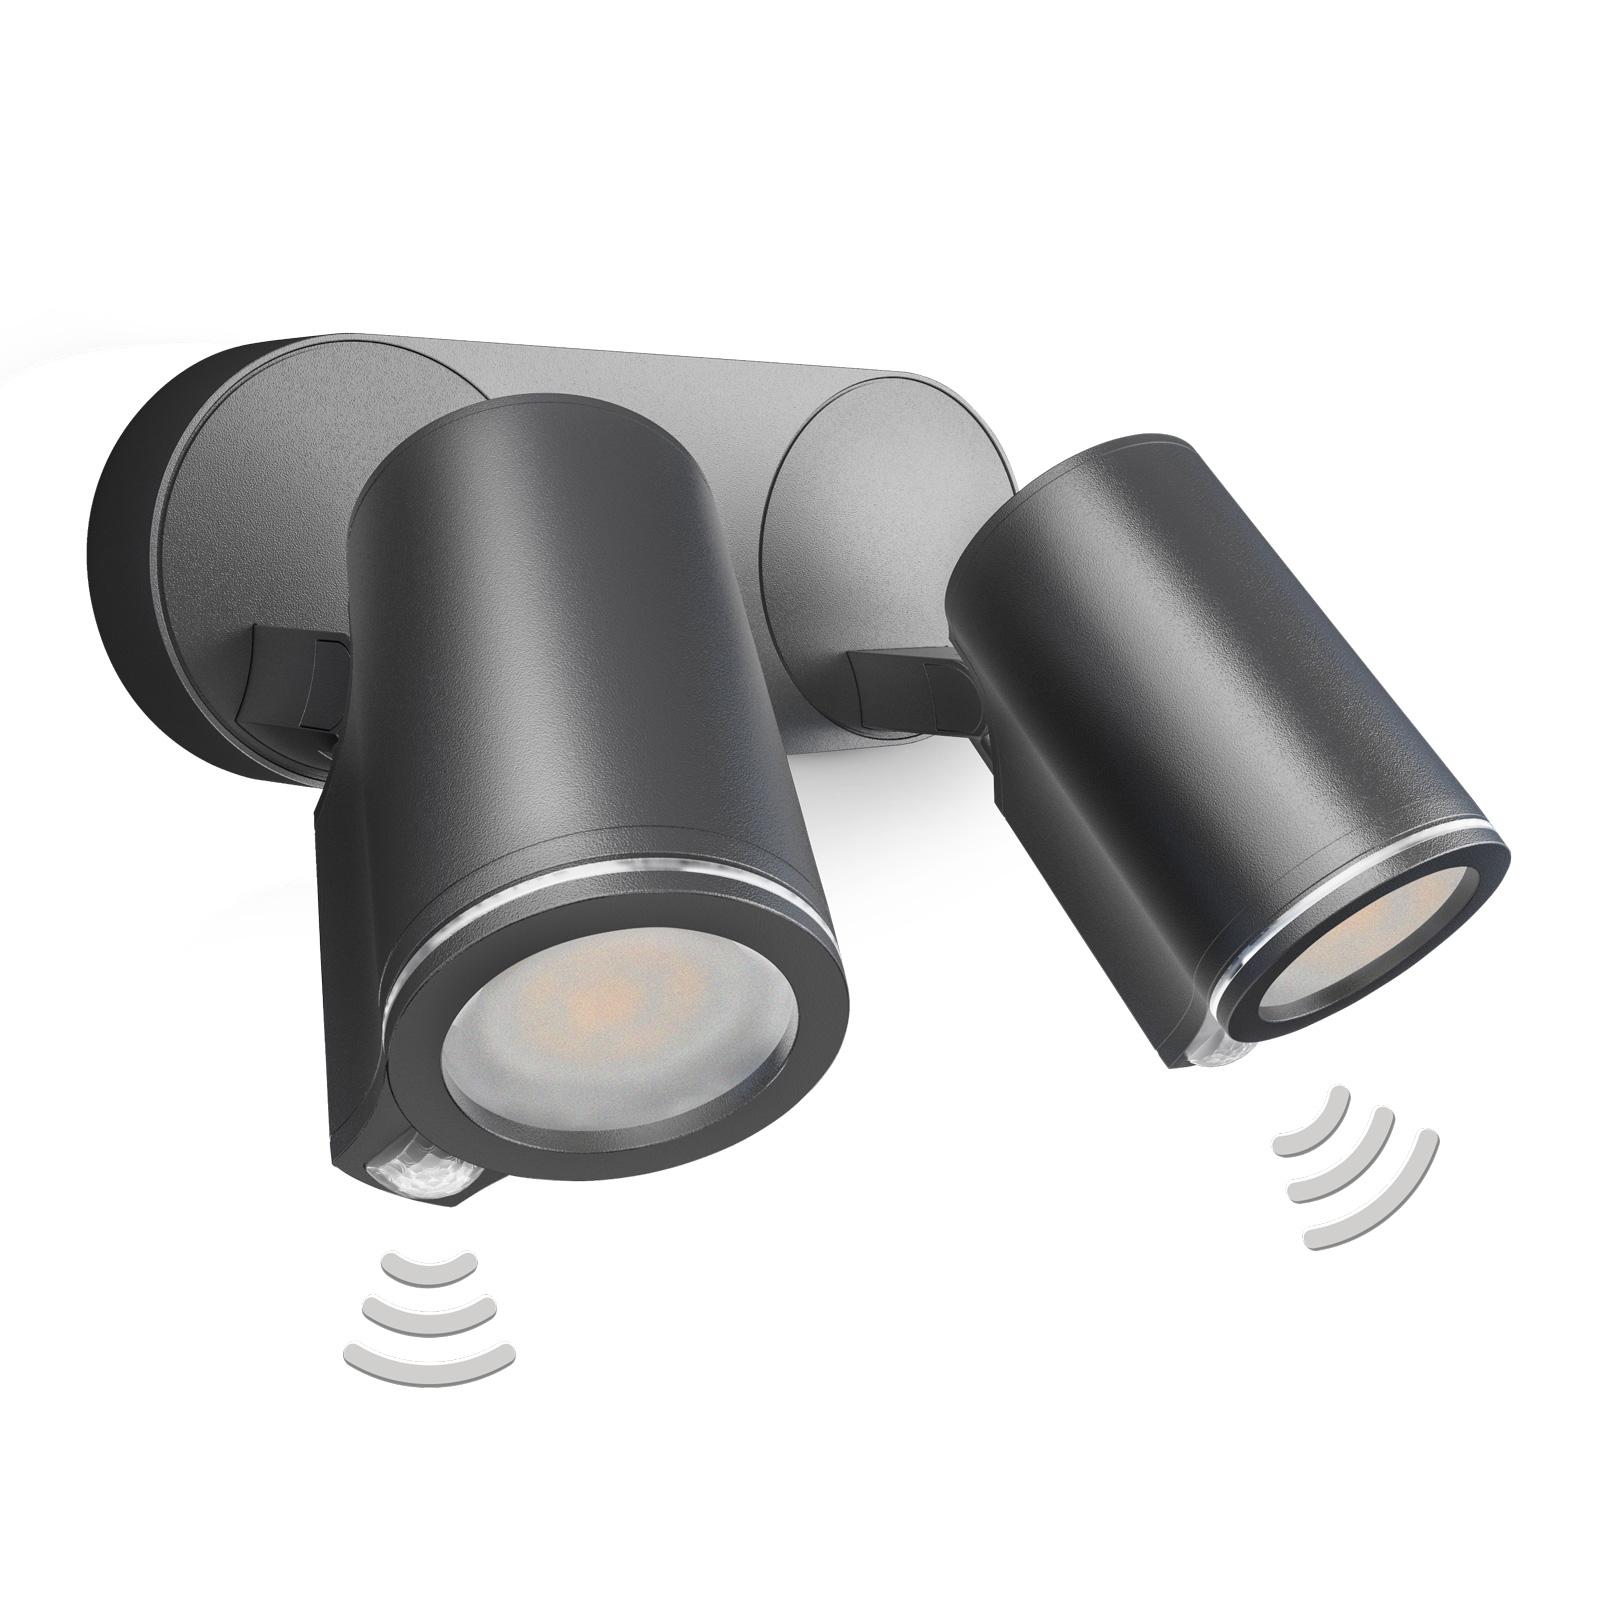 STEINEL Spot Duo Sensor Connect foco LED 2 luces